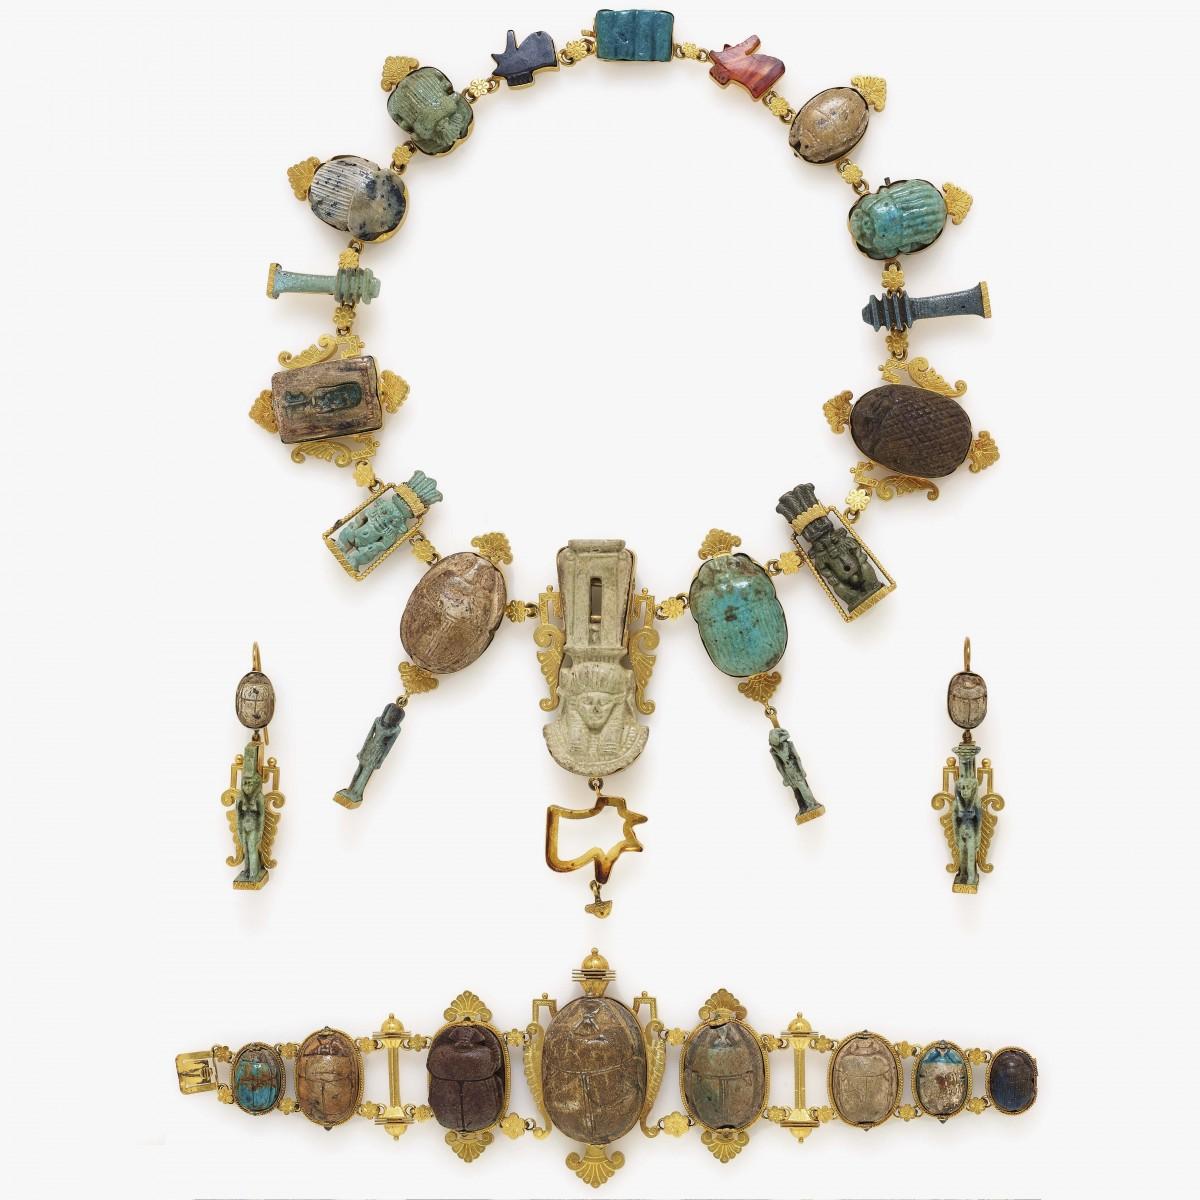 Egyptian jewelery set with amulets